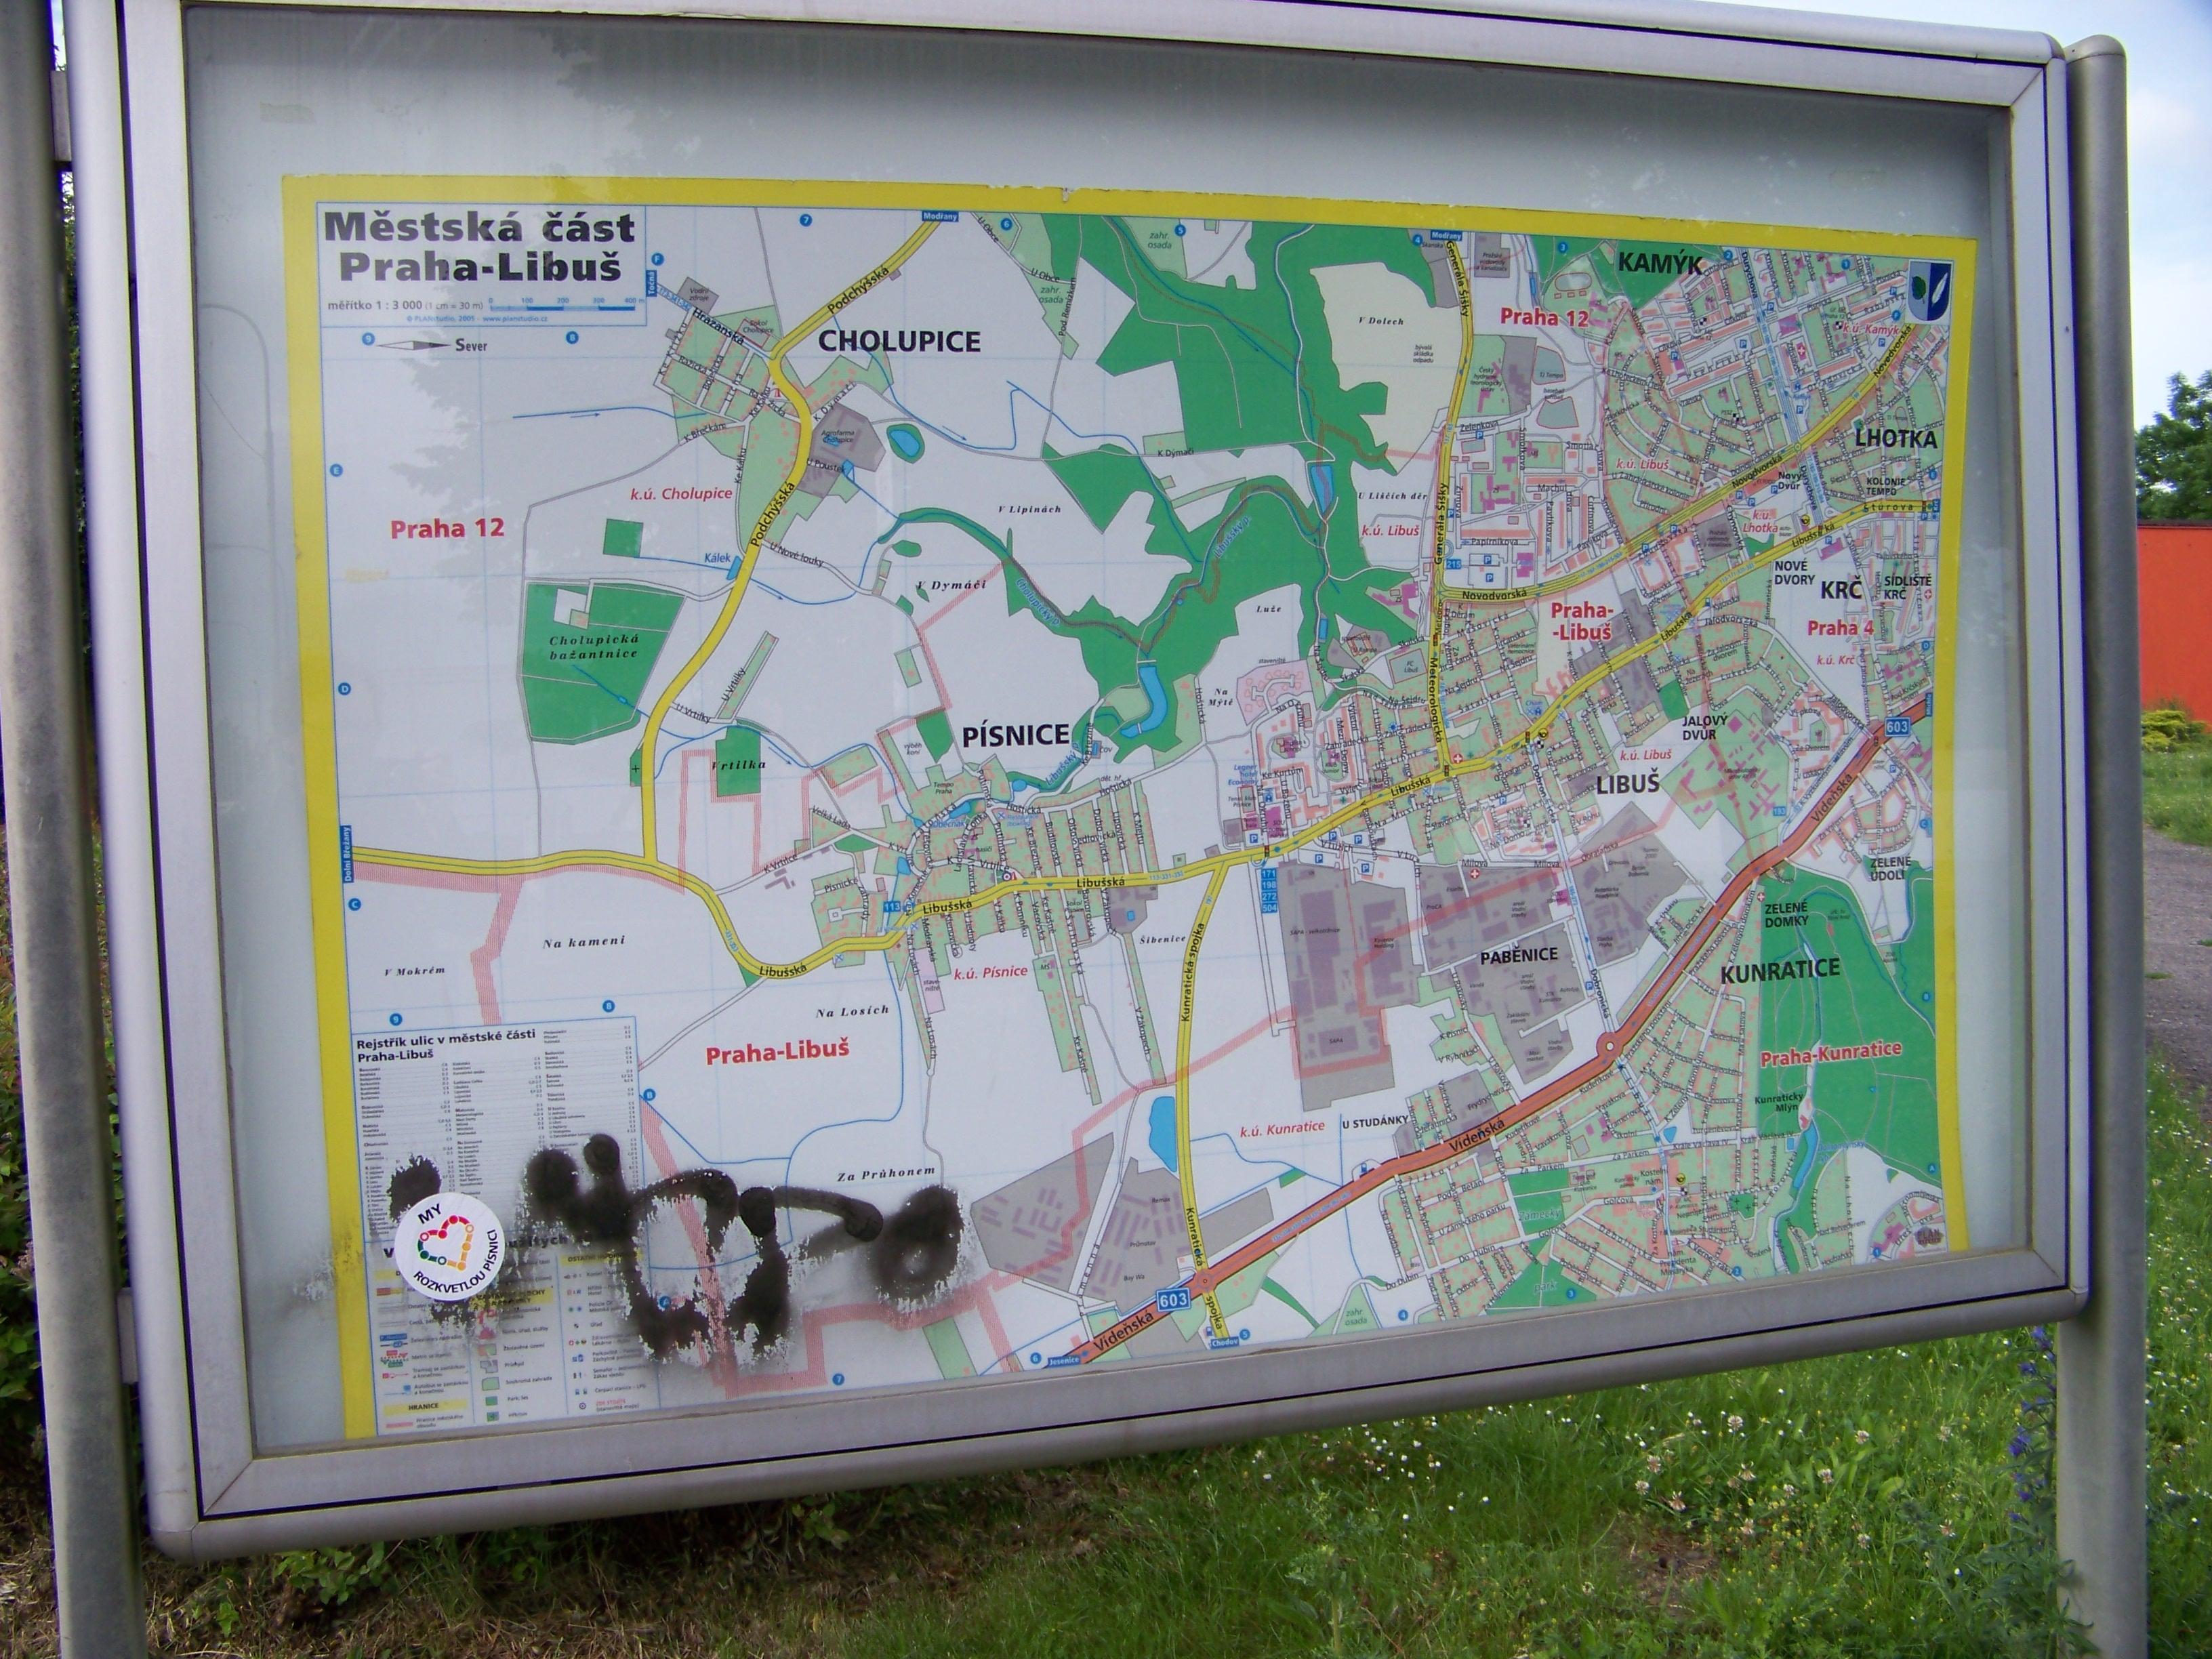 File Mapa Mestske Casti Praha Libus Jpg Wikimedia Commons